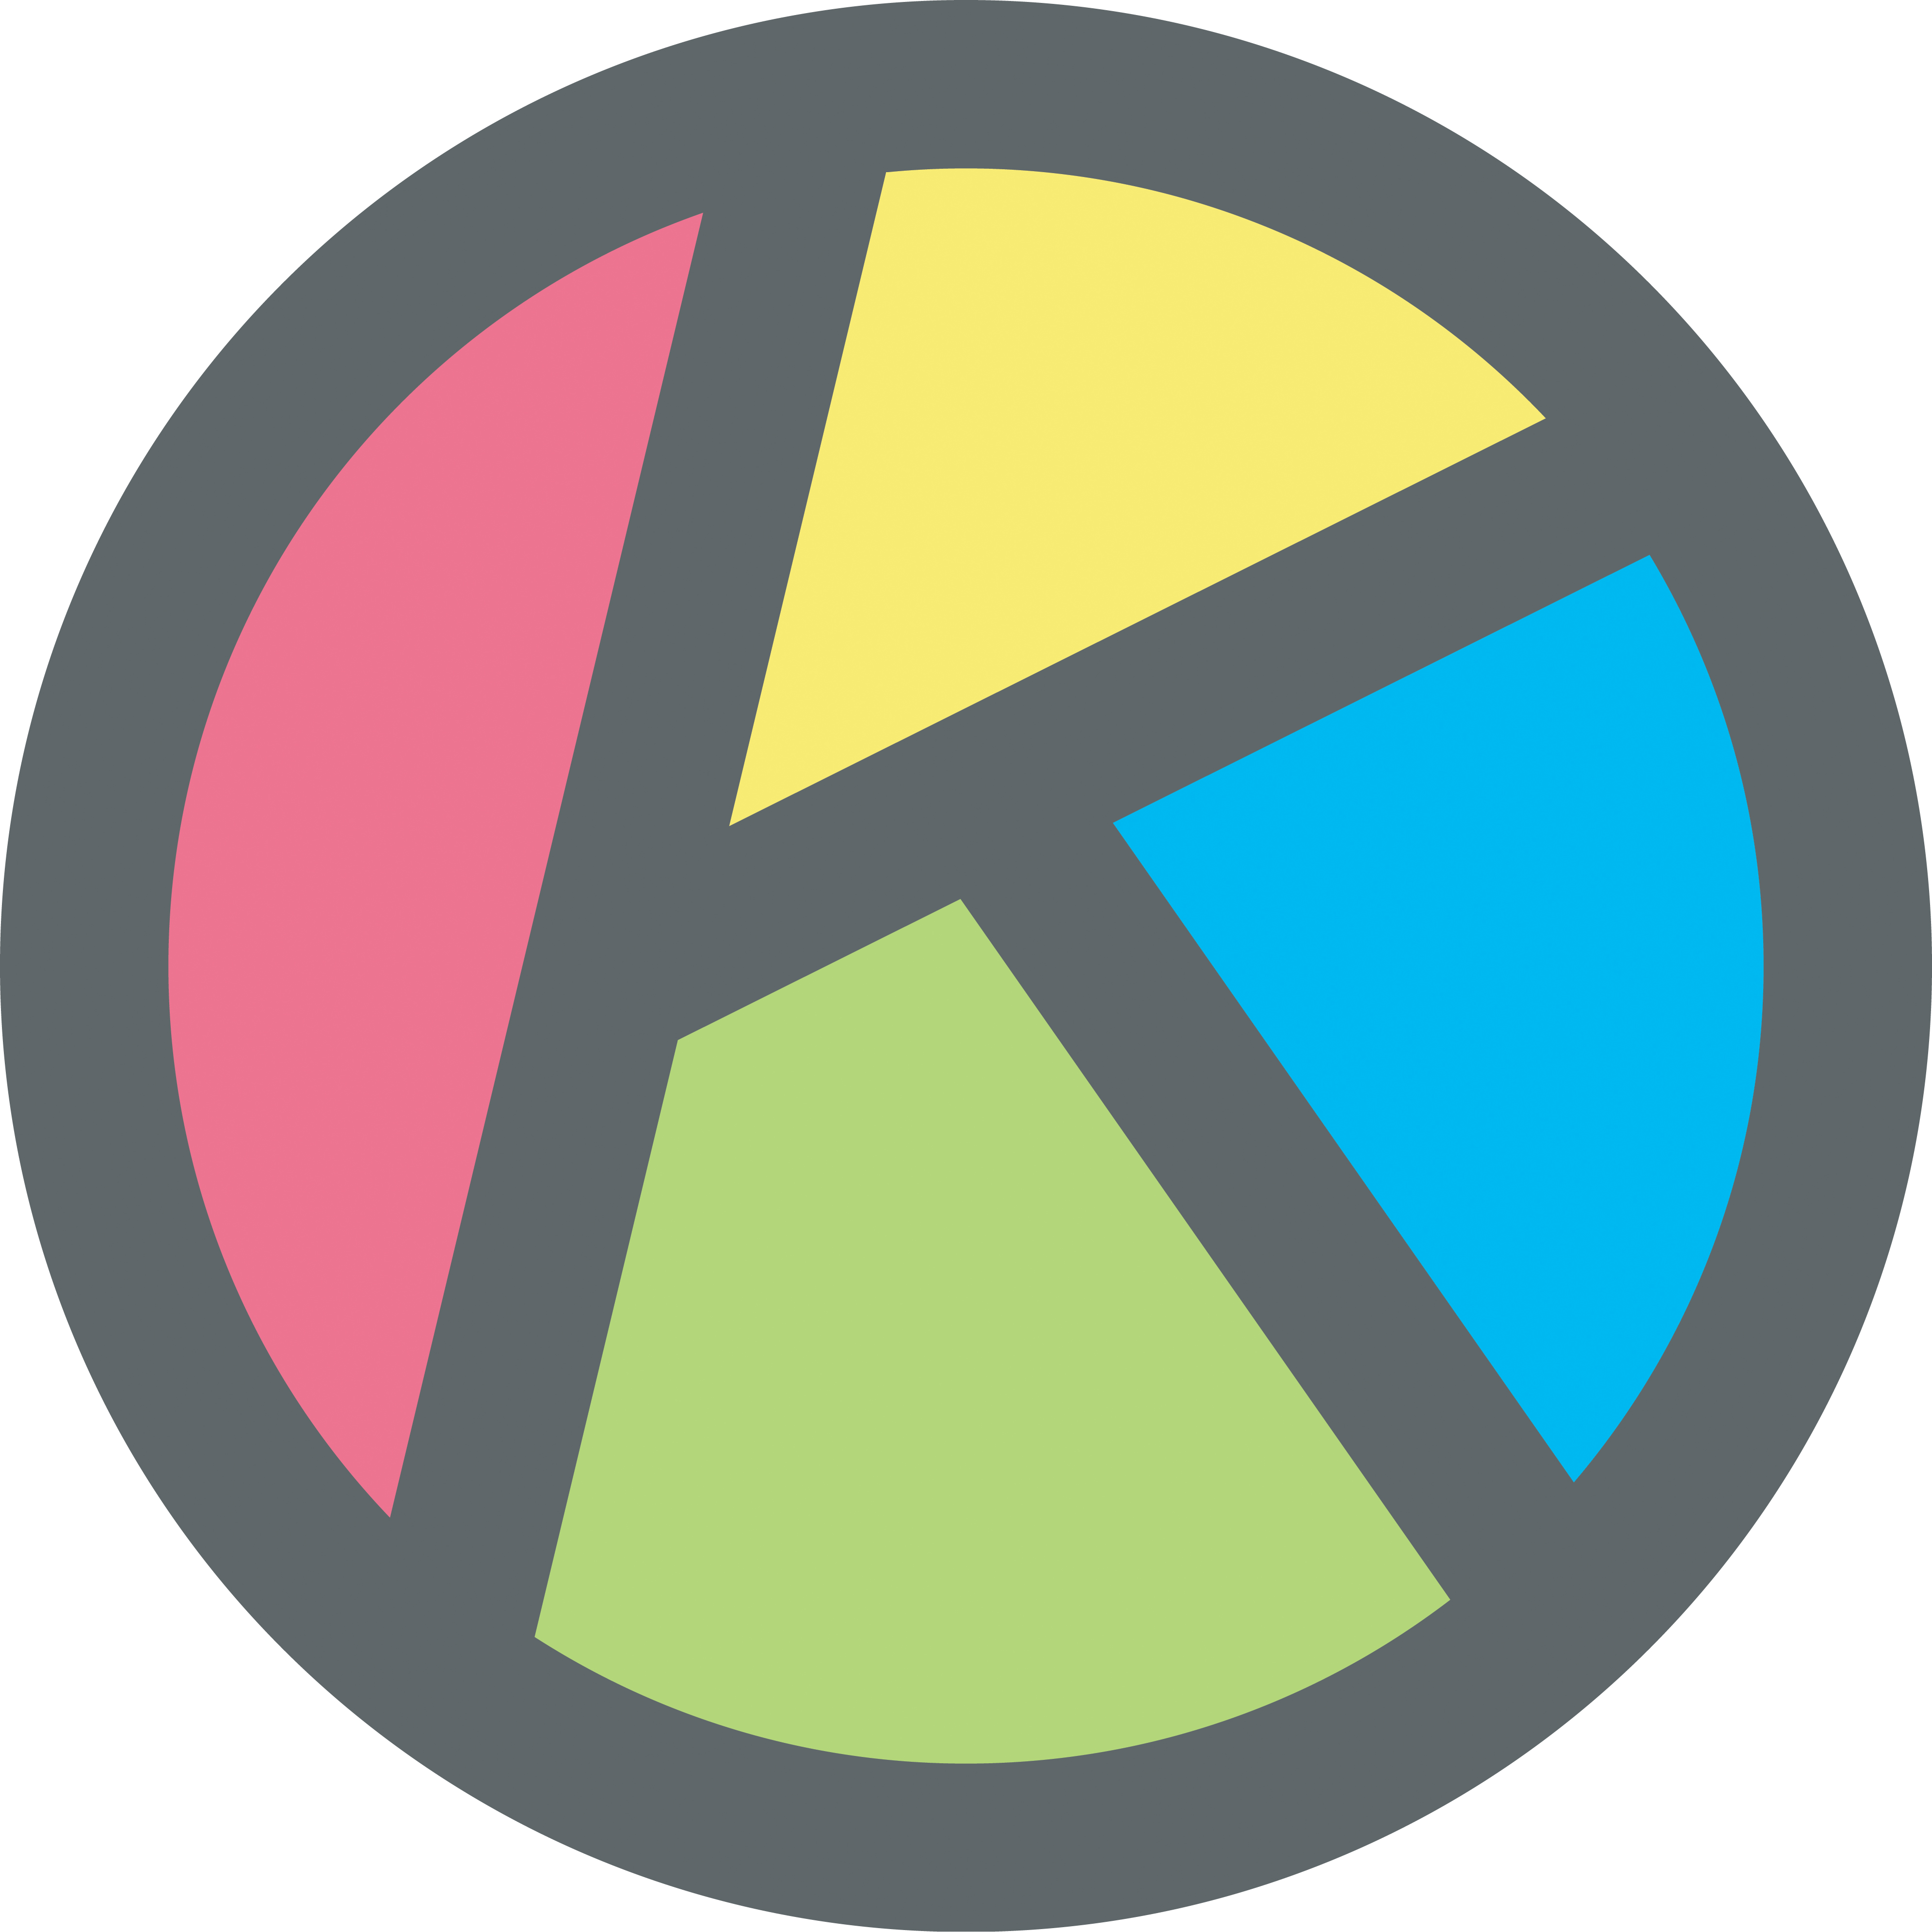 K_K_Works(レザーコンチョ屋さん)